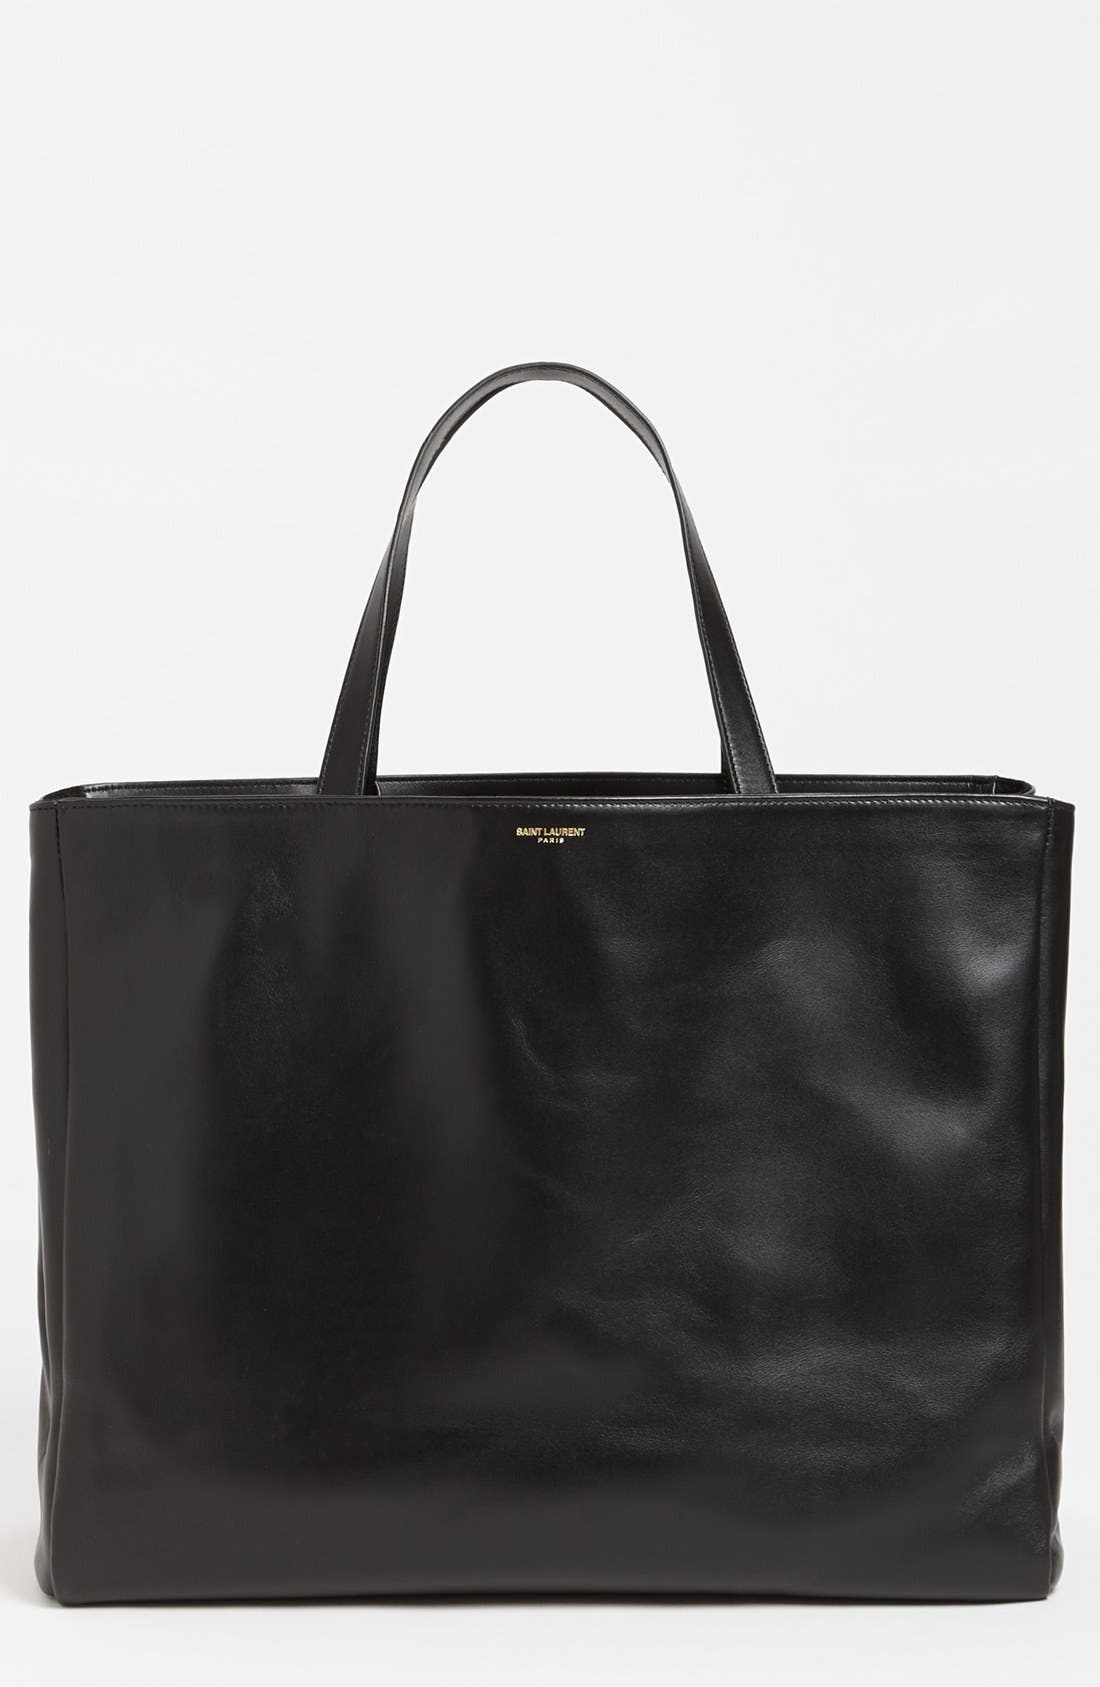 Alternate Image 1 Selected - Saint Laurent Leather Tote, Large